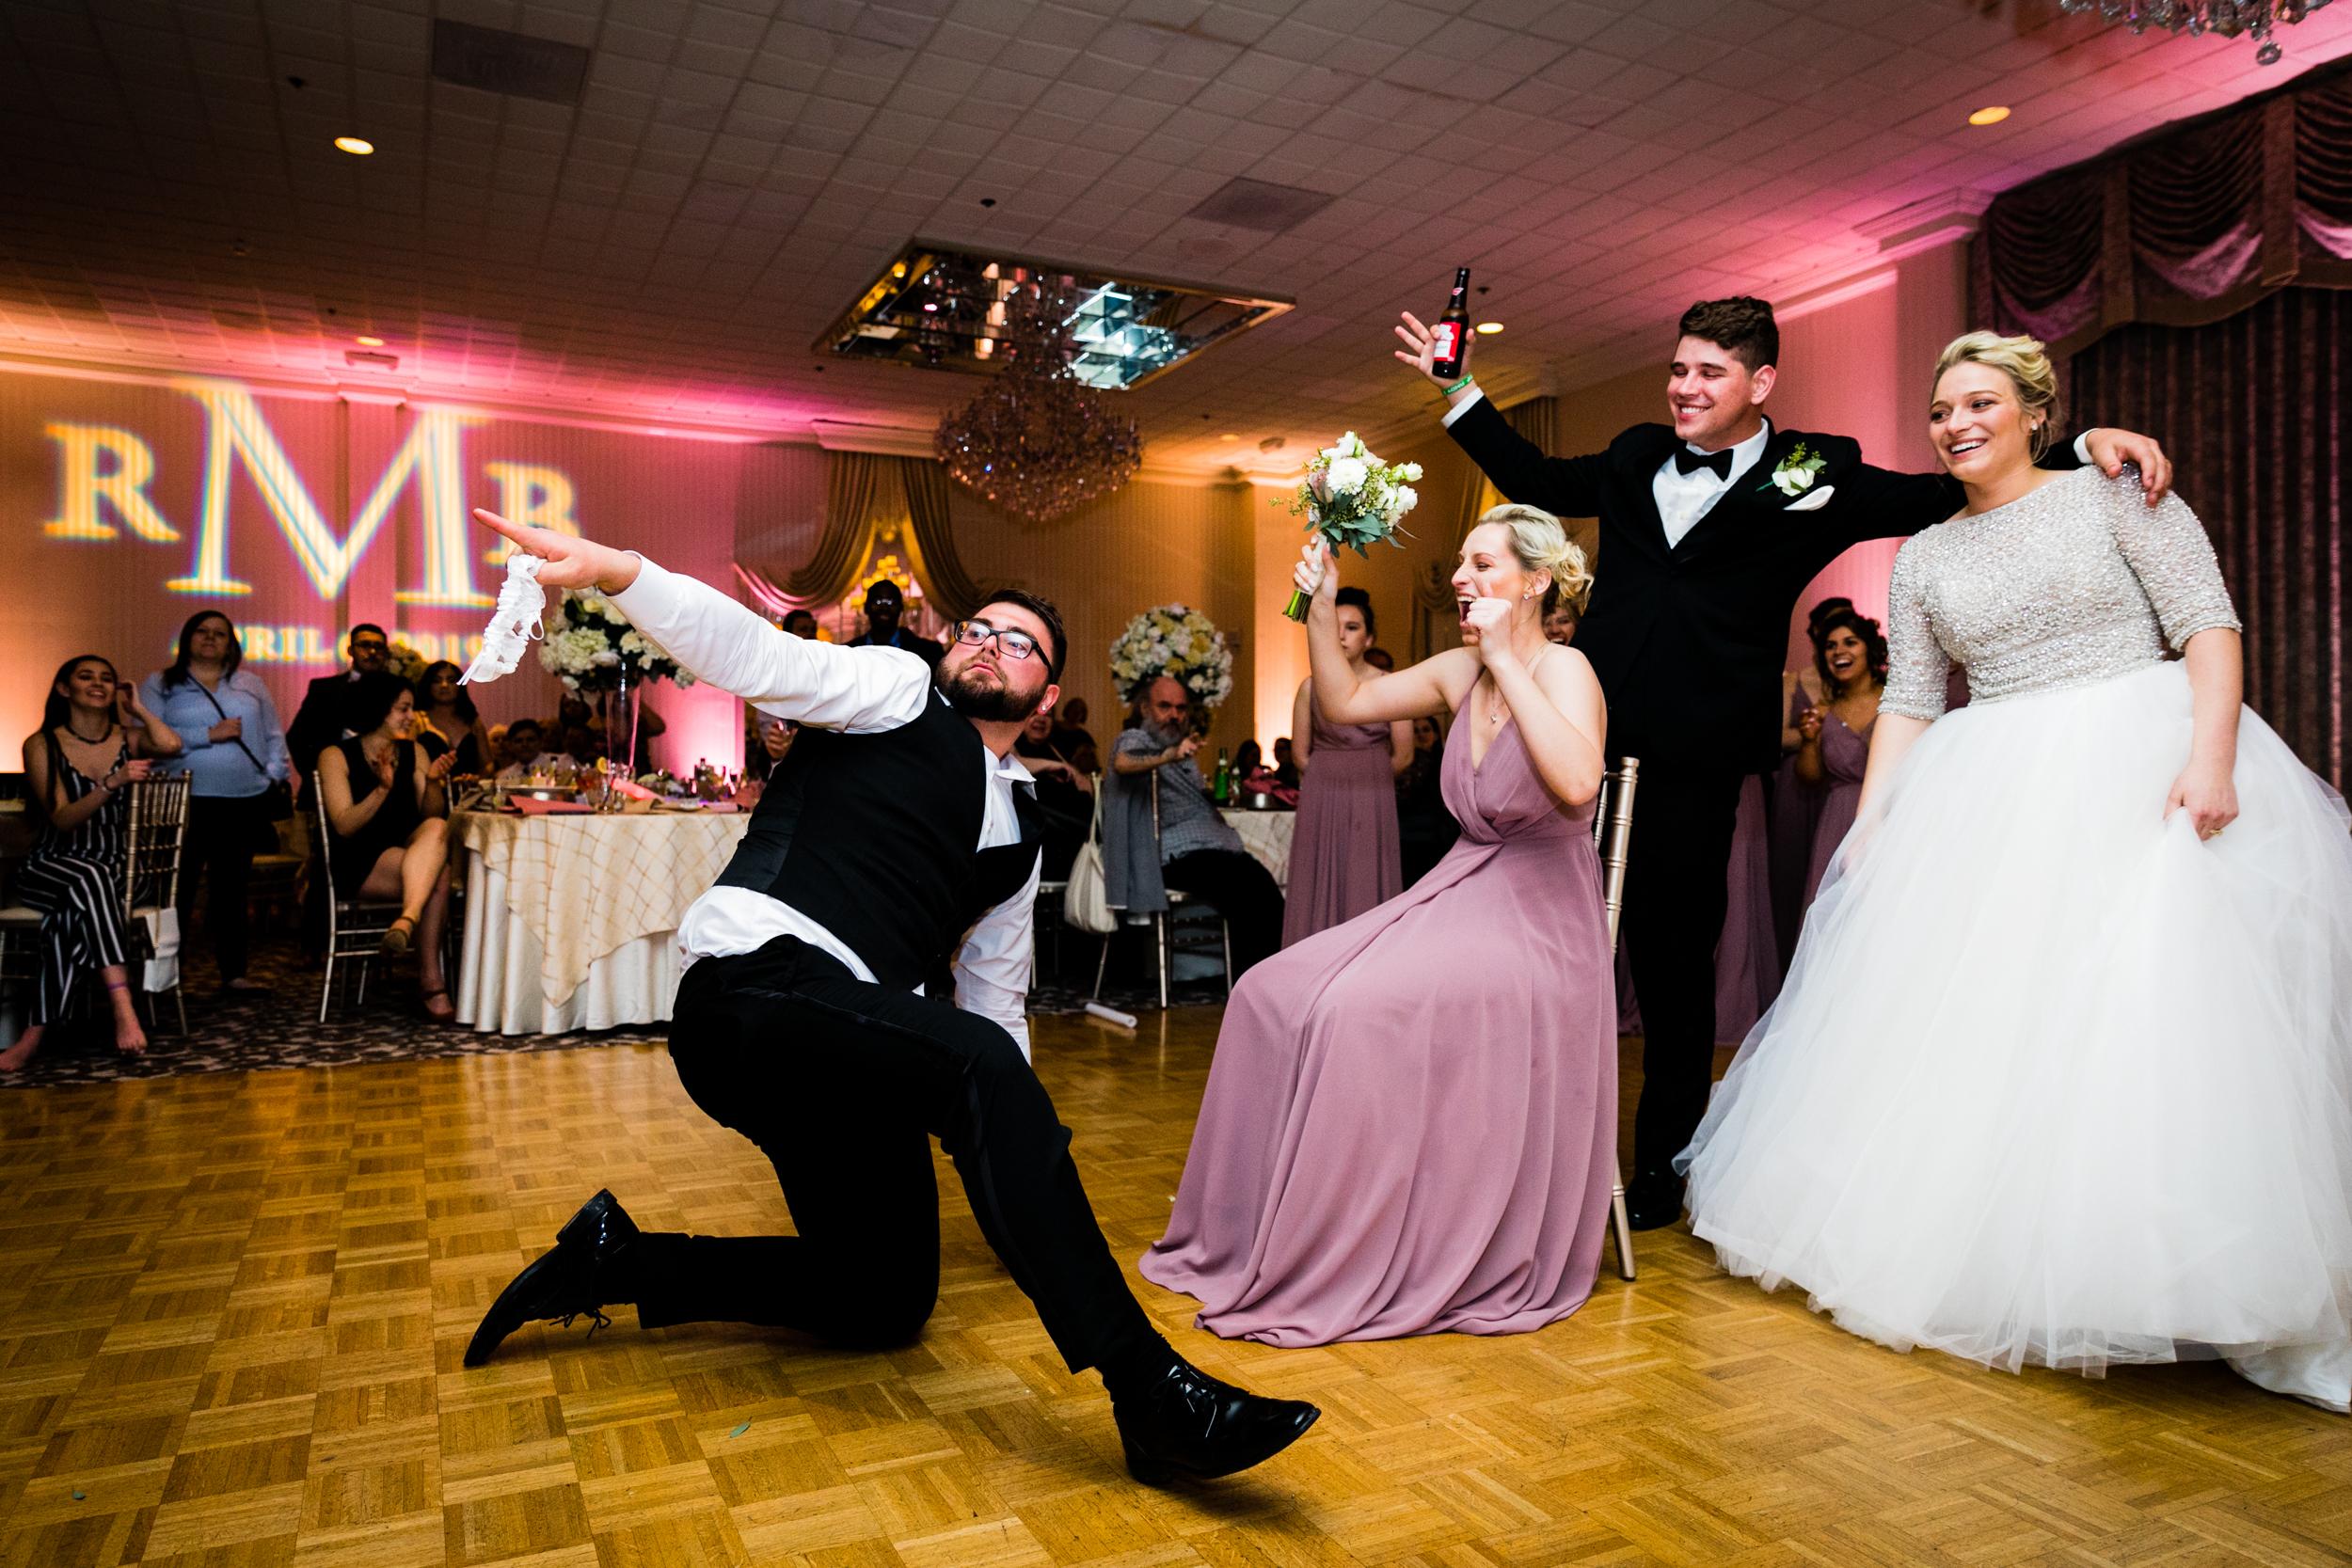 CELEBRATIONS BENSALEM WEDDING PHOTOGRAPHY-117.jpg